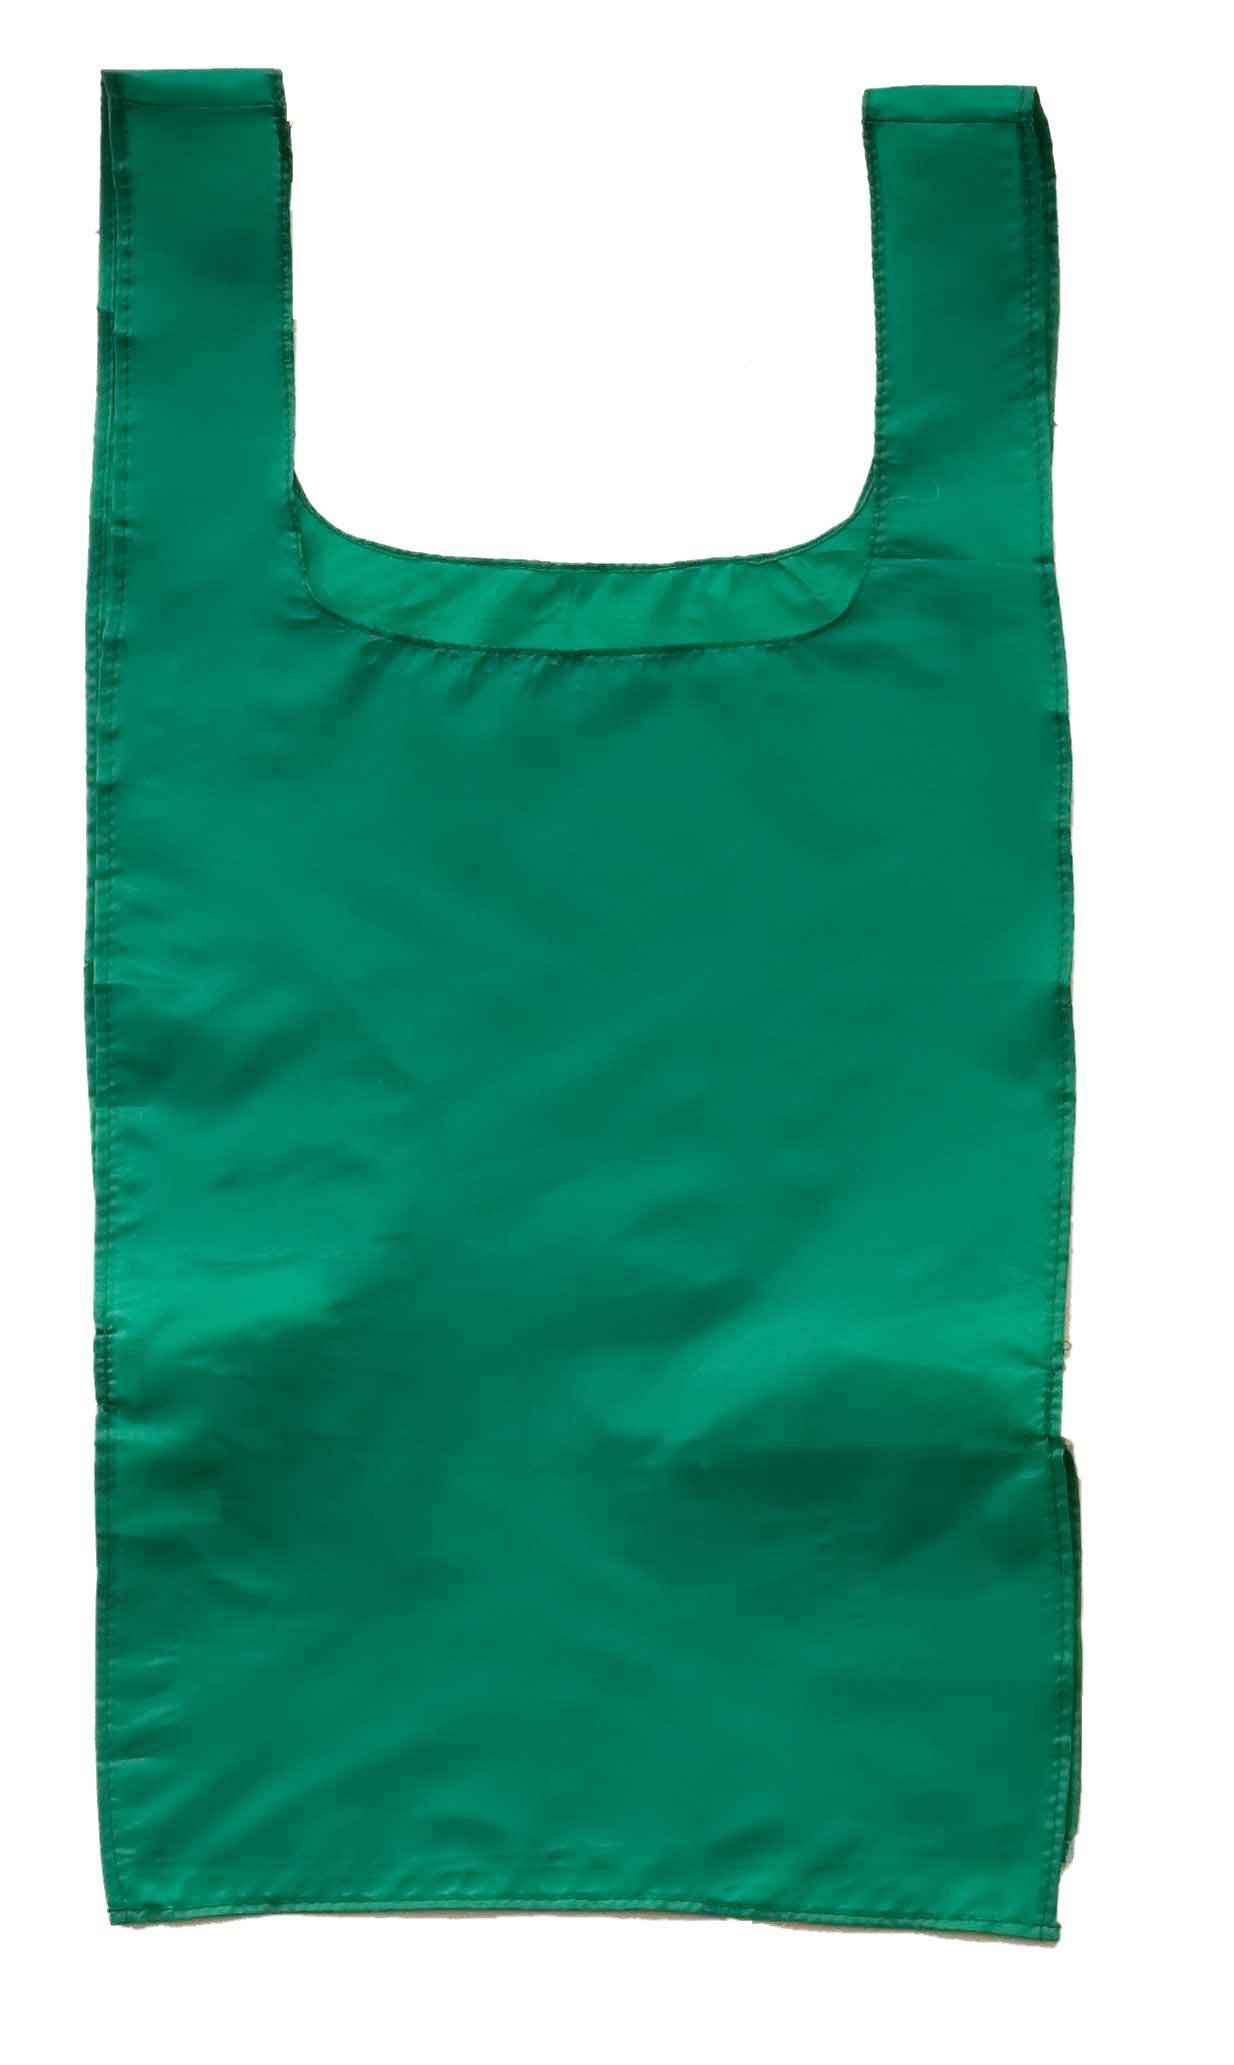 US Games Adult Nylon Pinnies (One Dozen) - Green